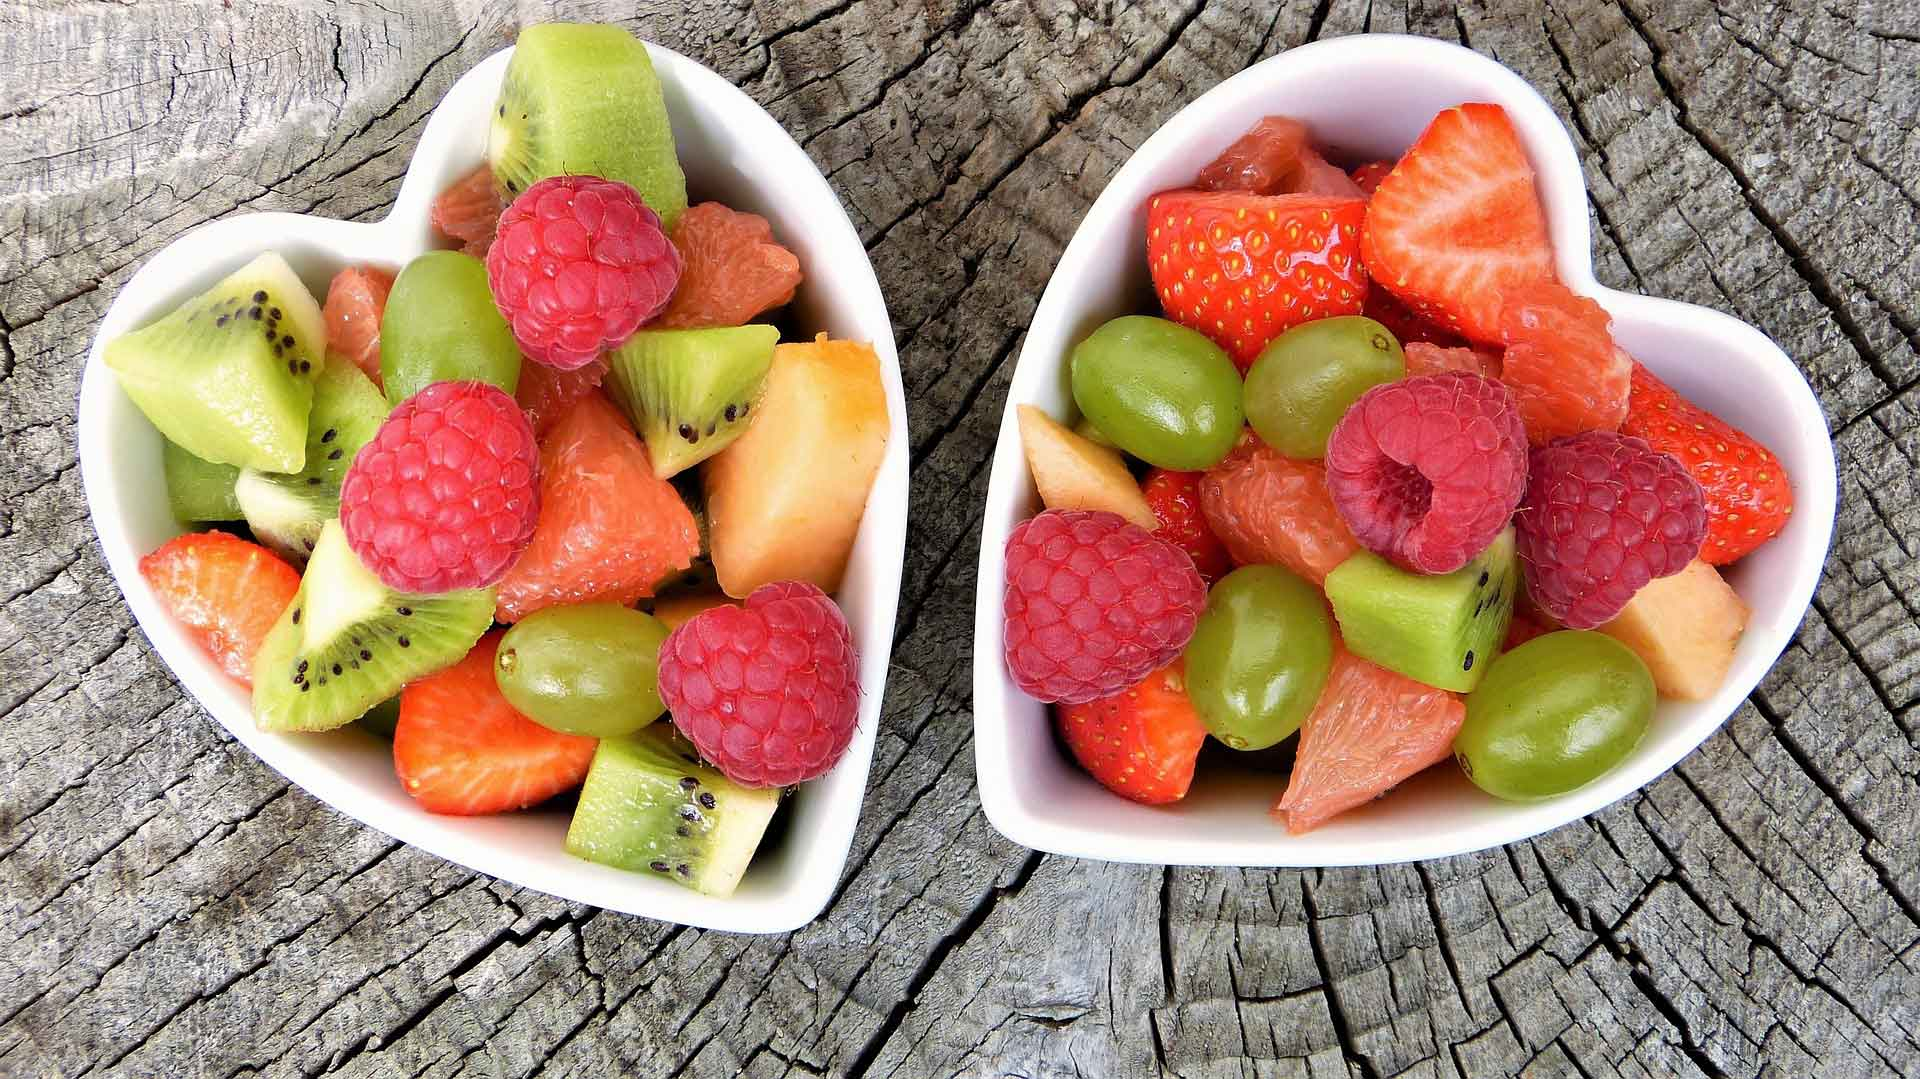 comida-cruda-fruta